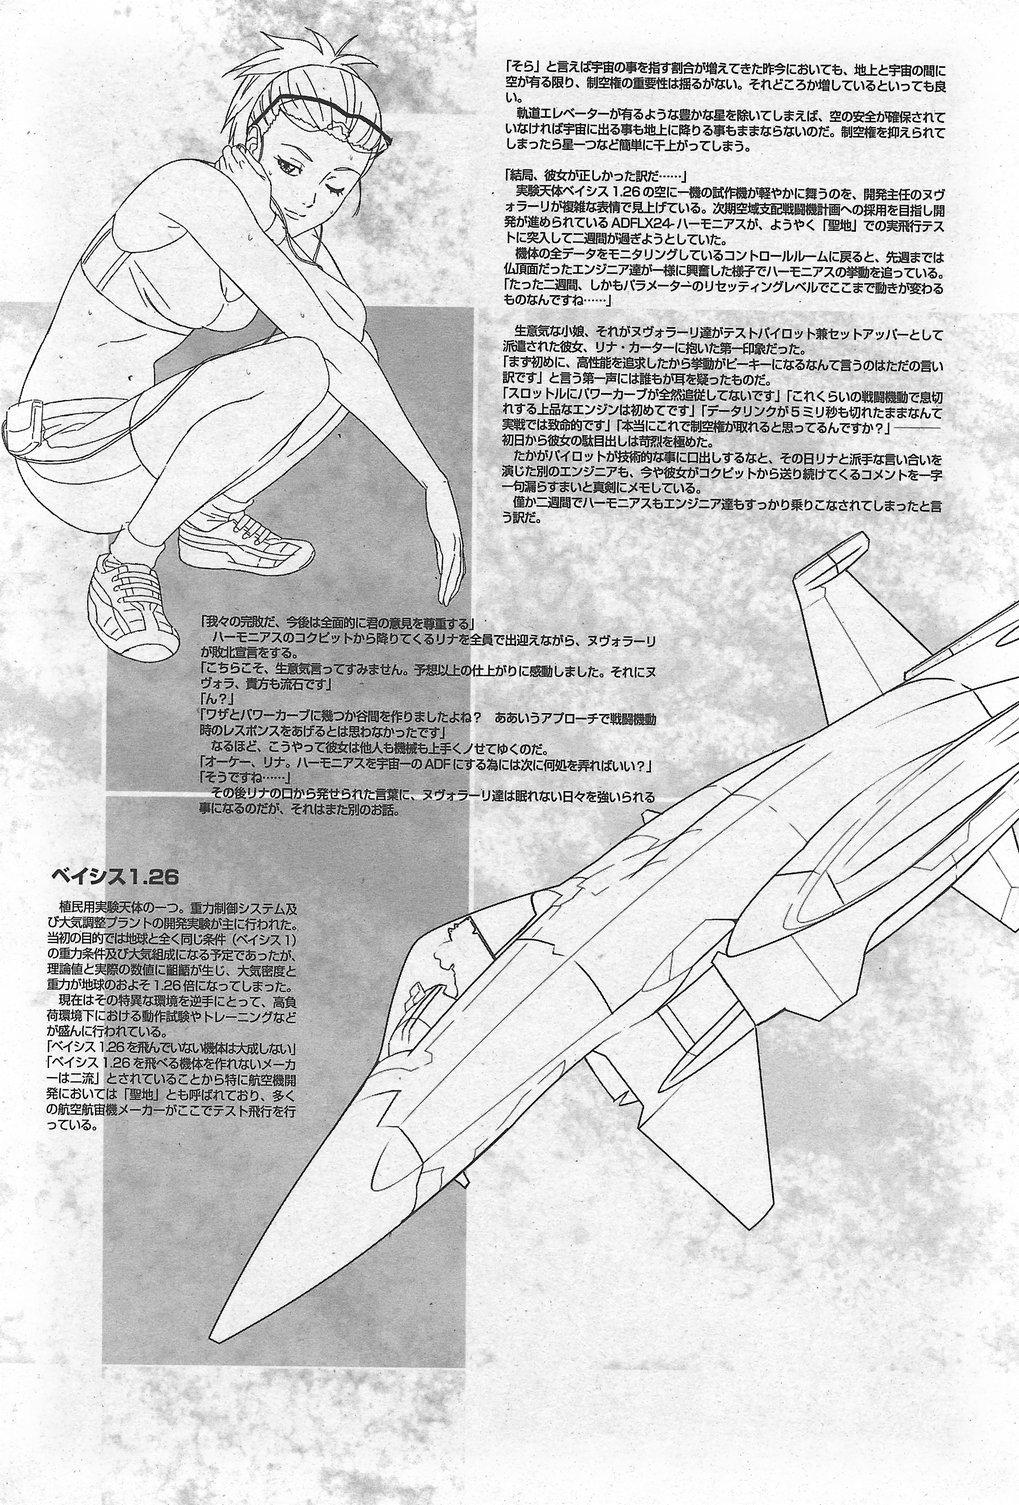 COMIC Penguin Club Sanzokuban 2007-10 Vol. 225 240